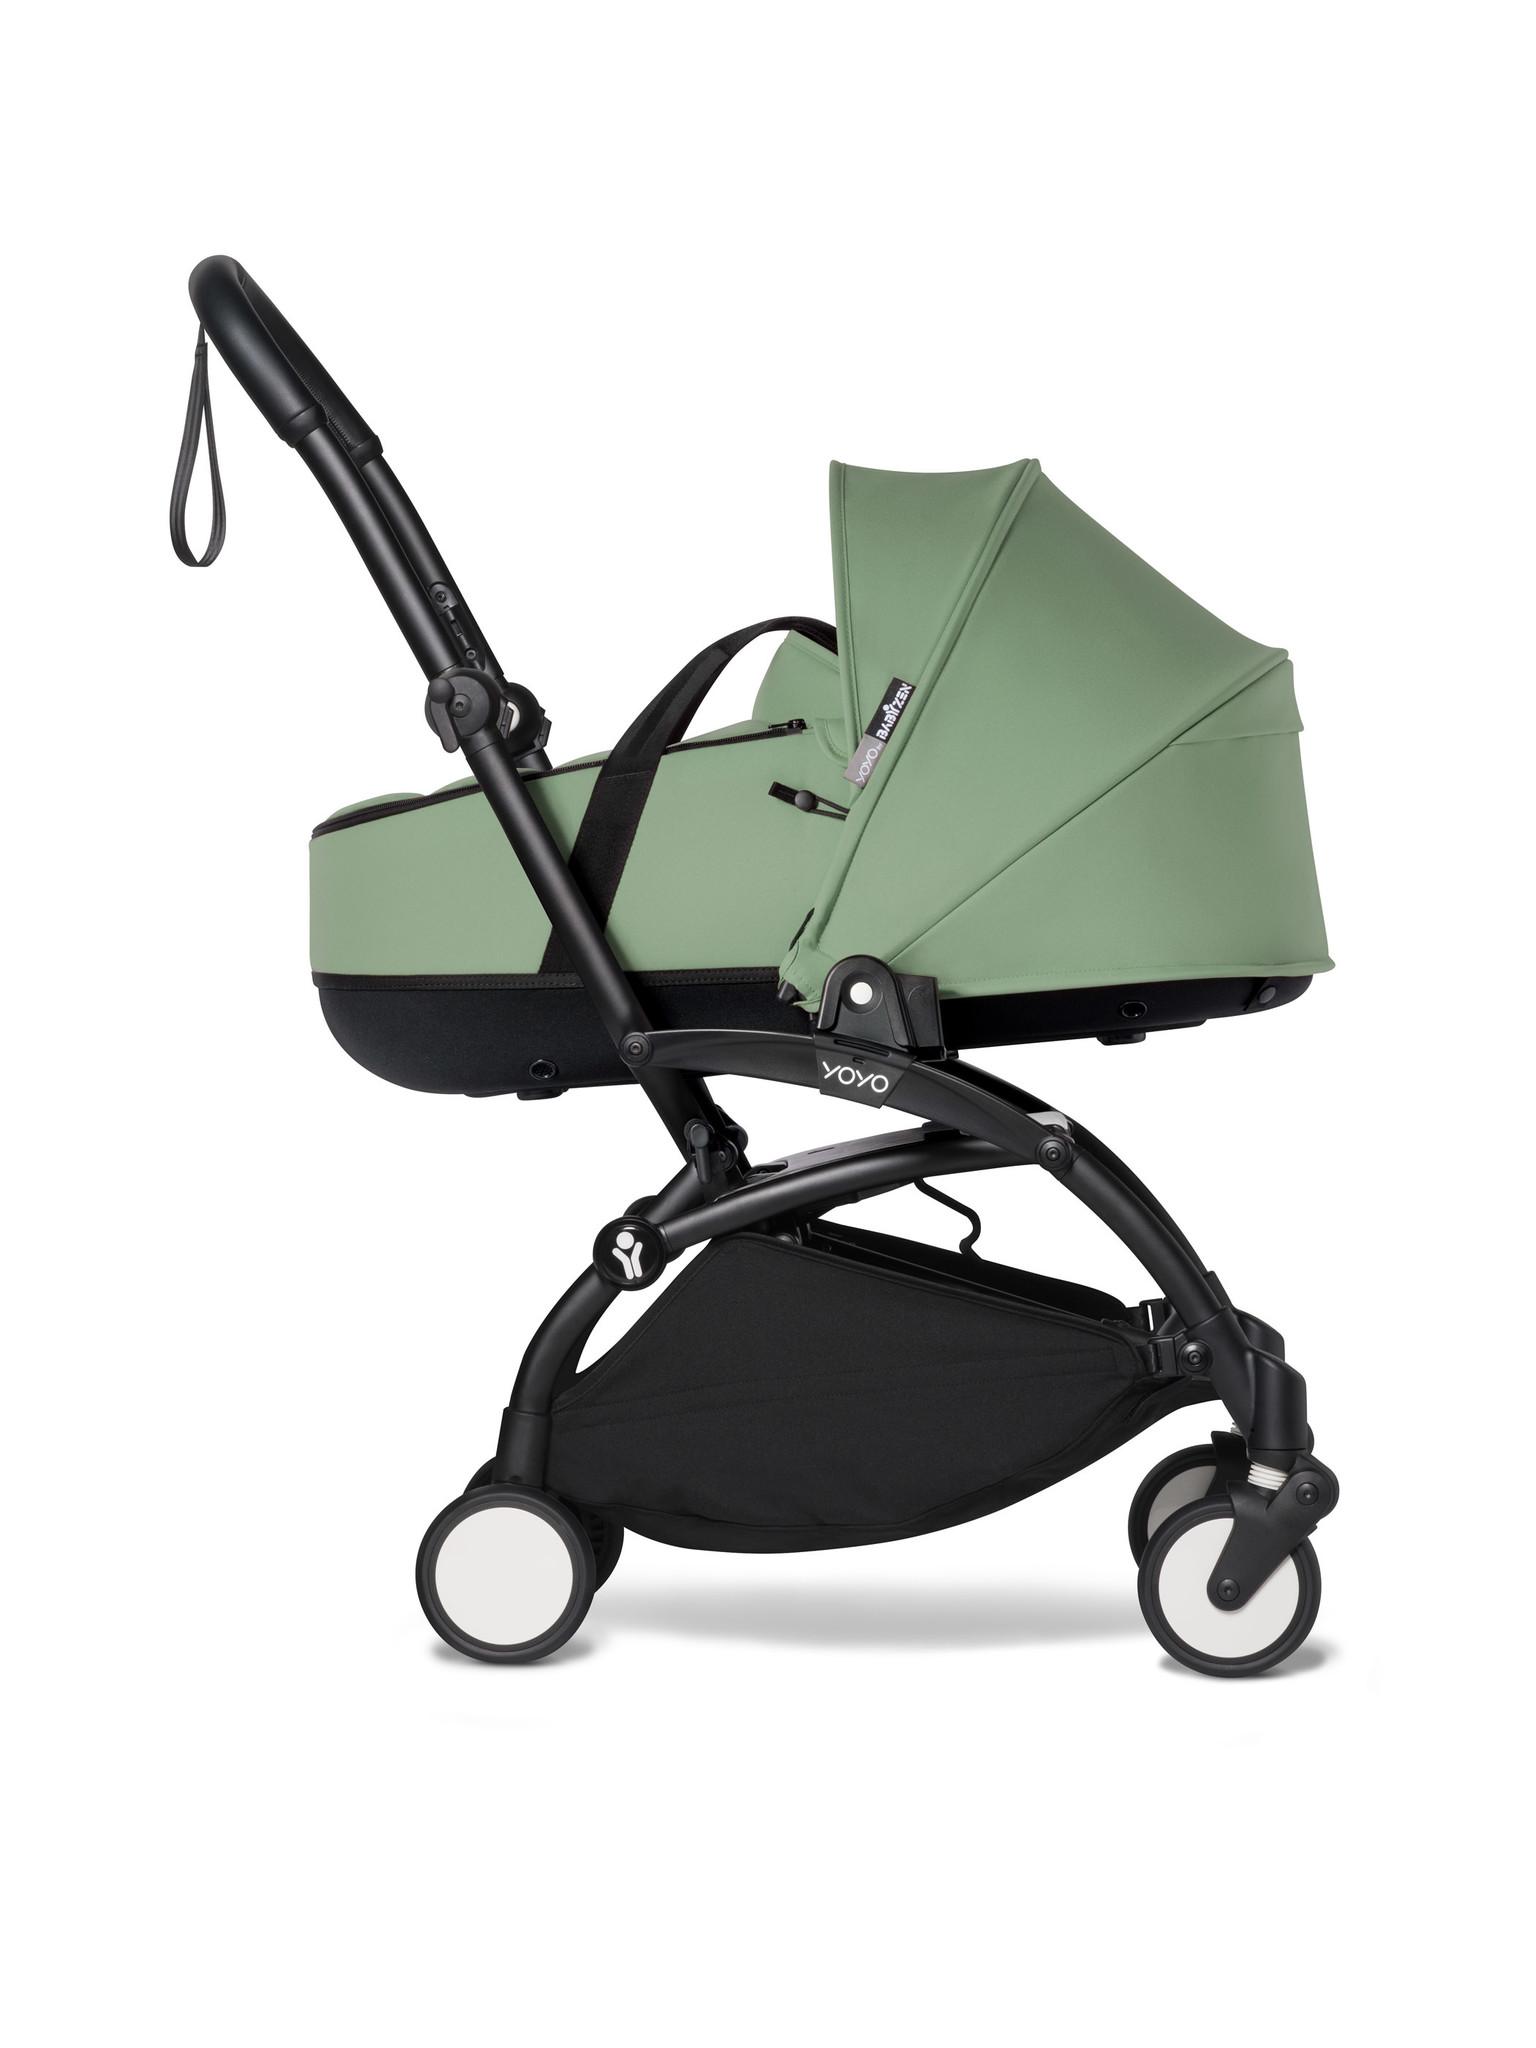 Babyzen Babyzen YOYO² schwarzer Rahmen mit YOYO Stubenwagen - Tragetasche - Pfefferminze